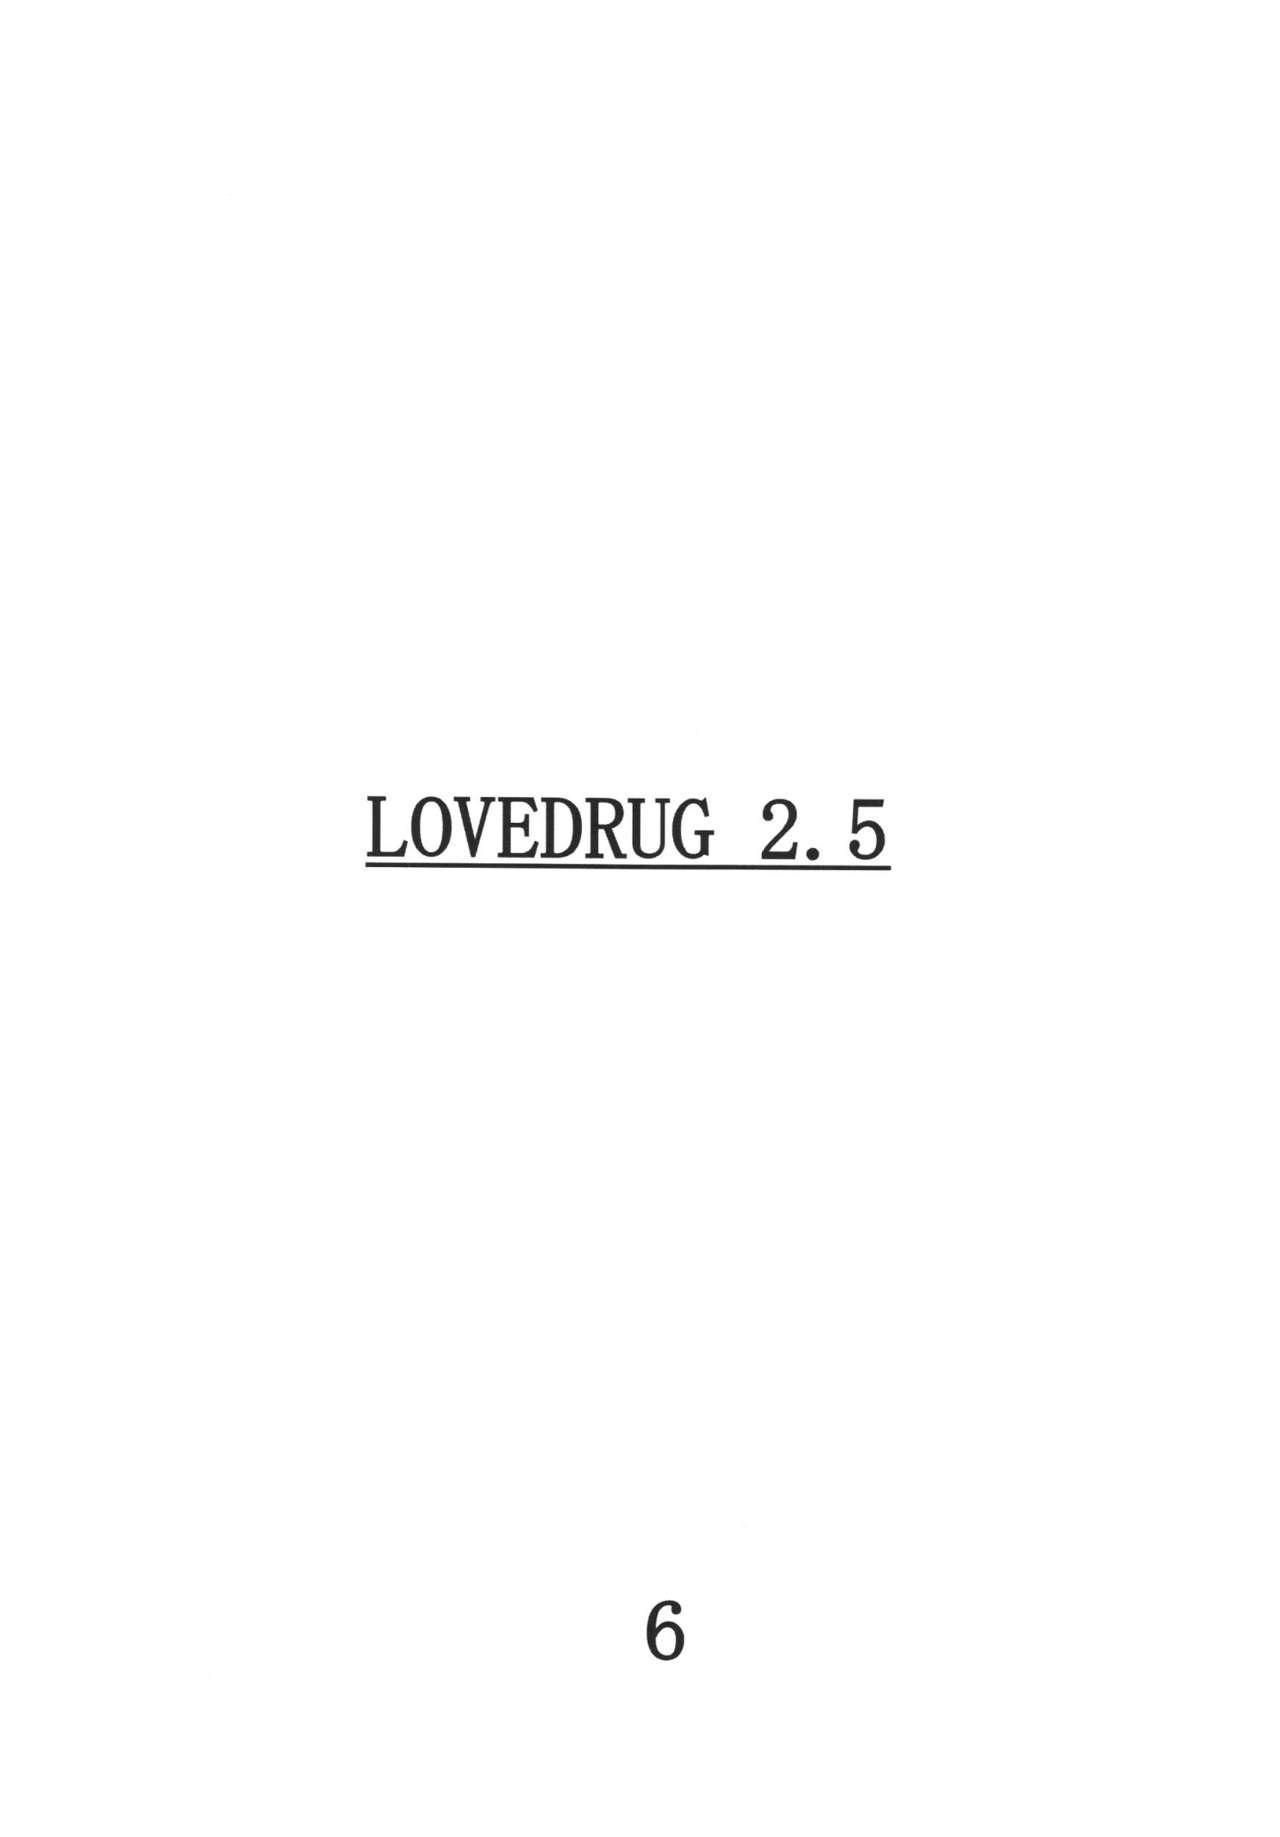 Lovedrug 2.5 4